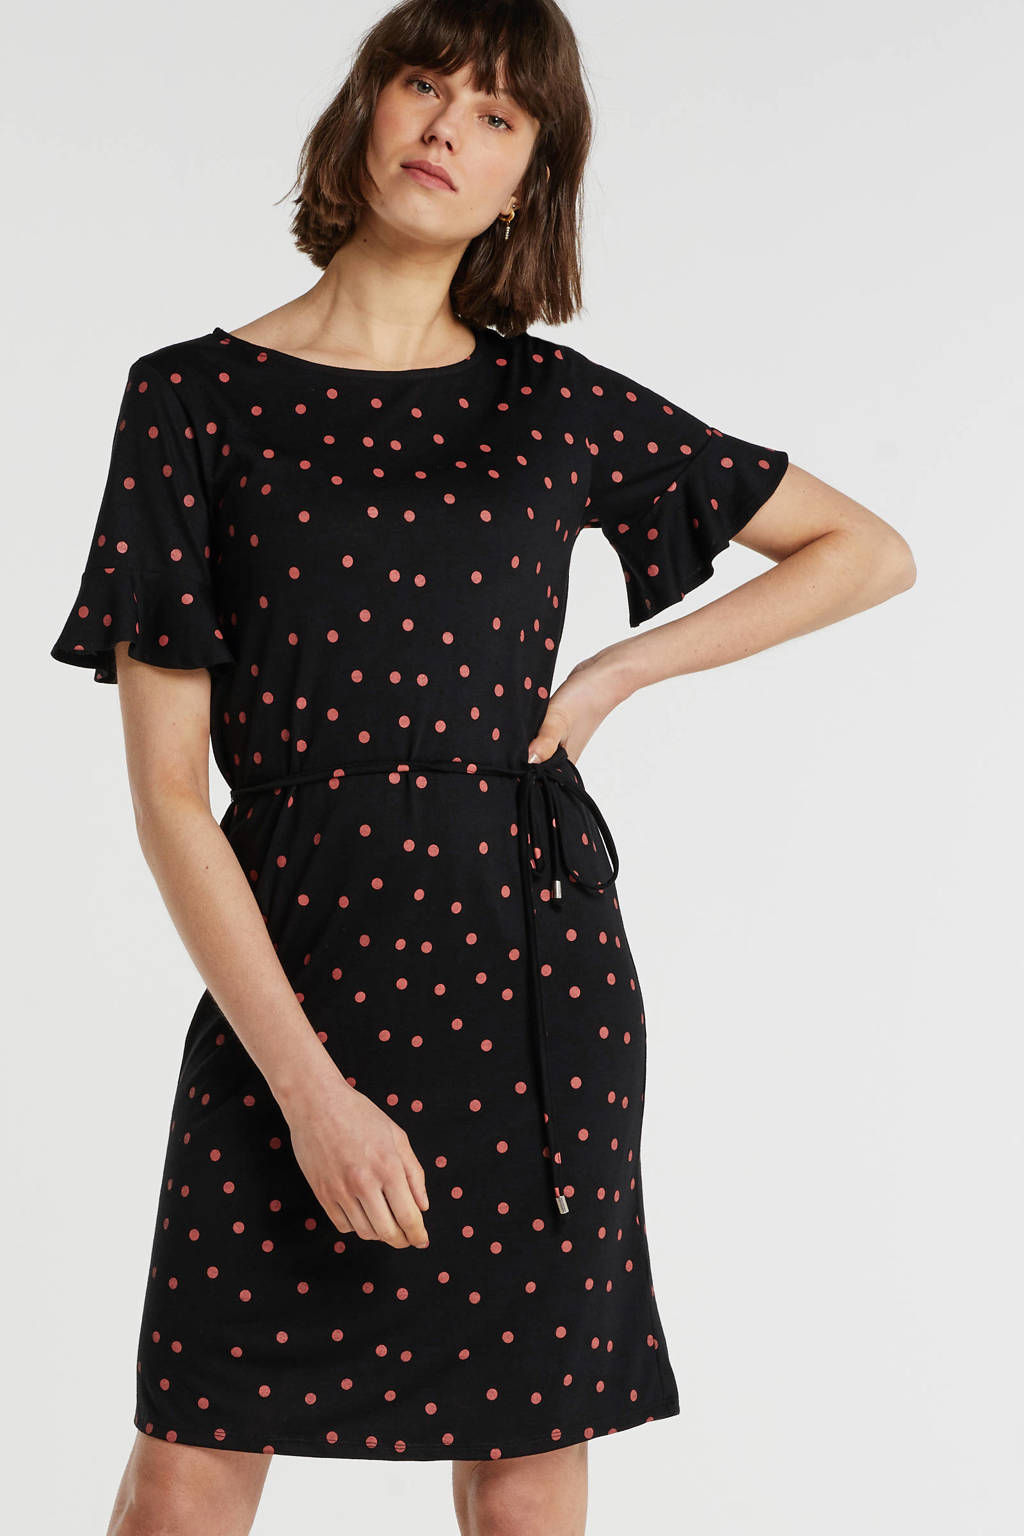 anytime jersey jurk met W2W polyester zwart met stippenprint, Zwart/rood